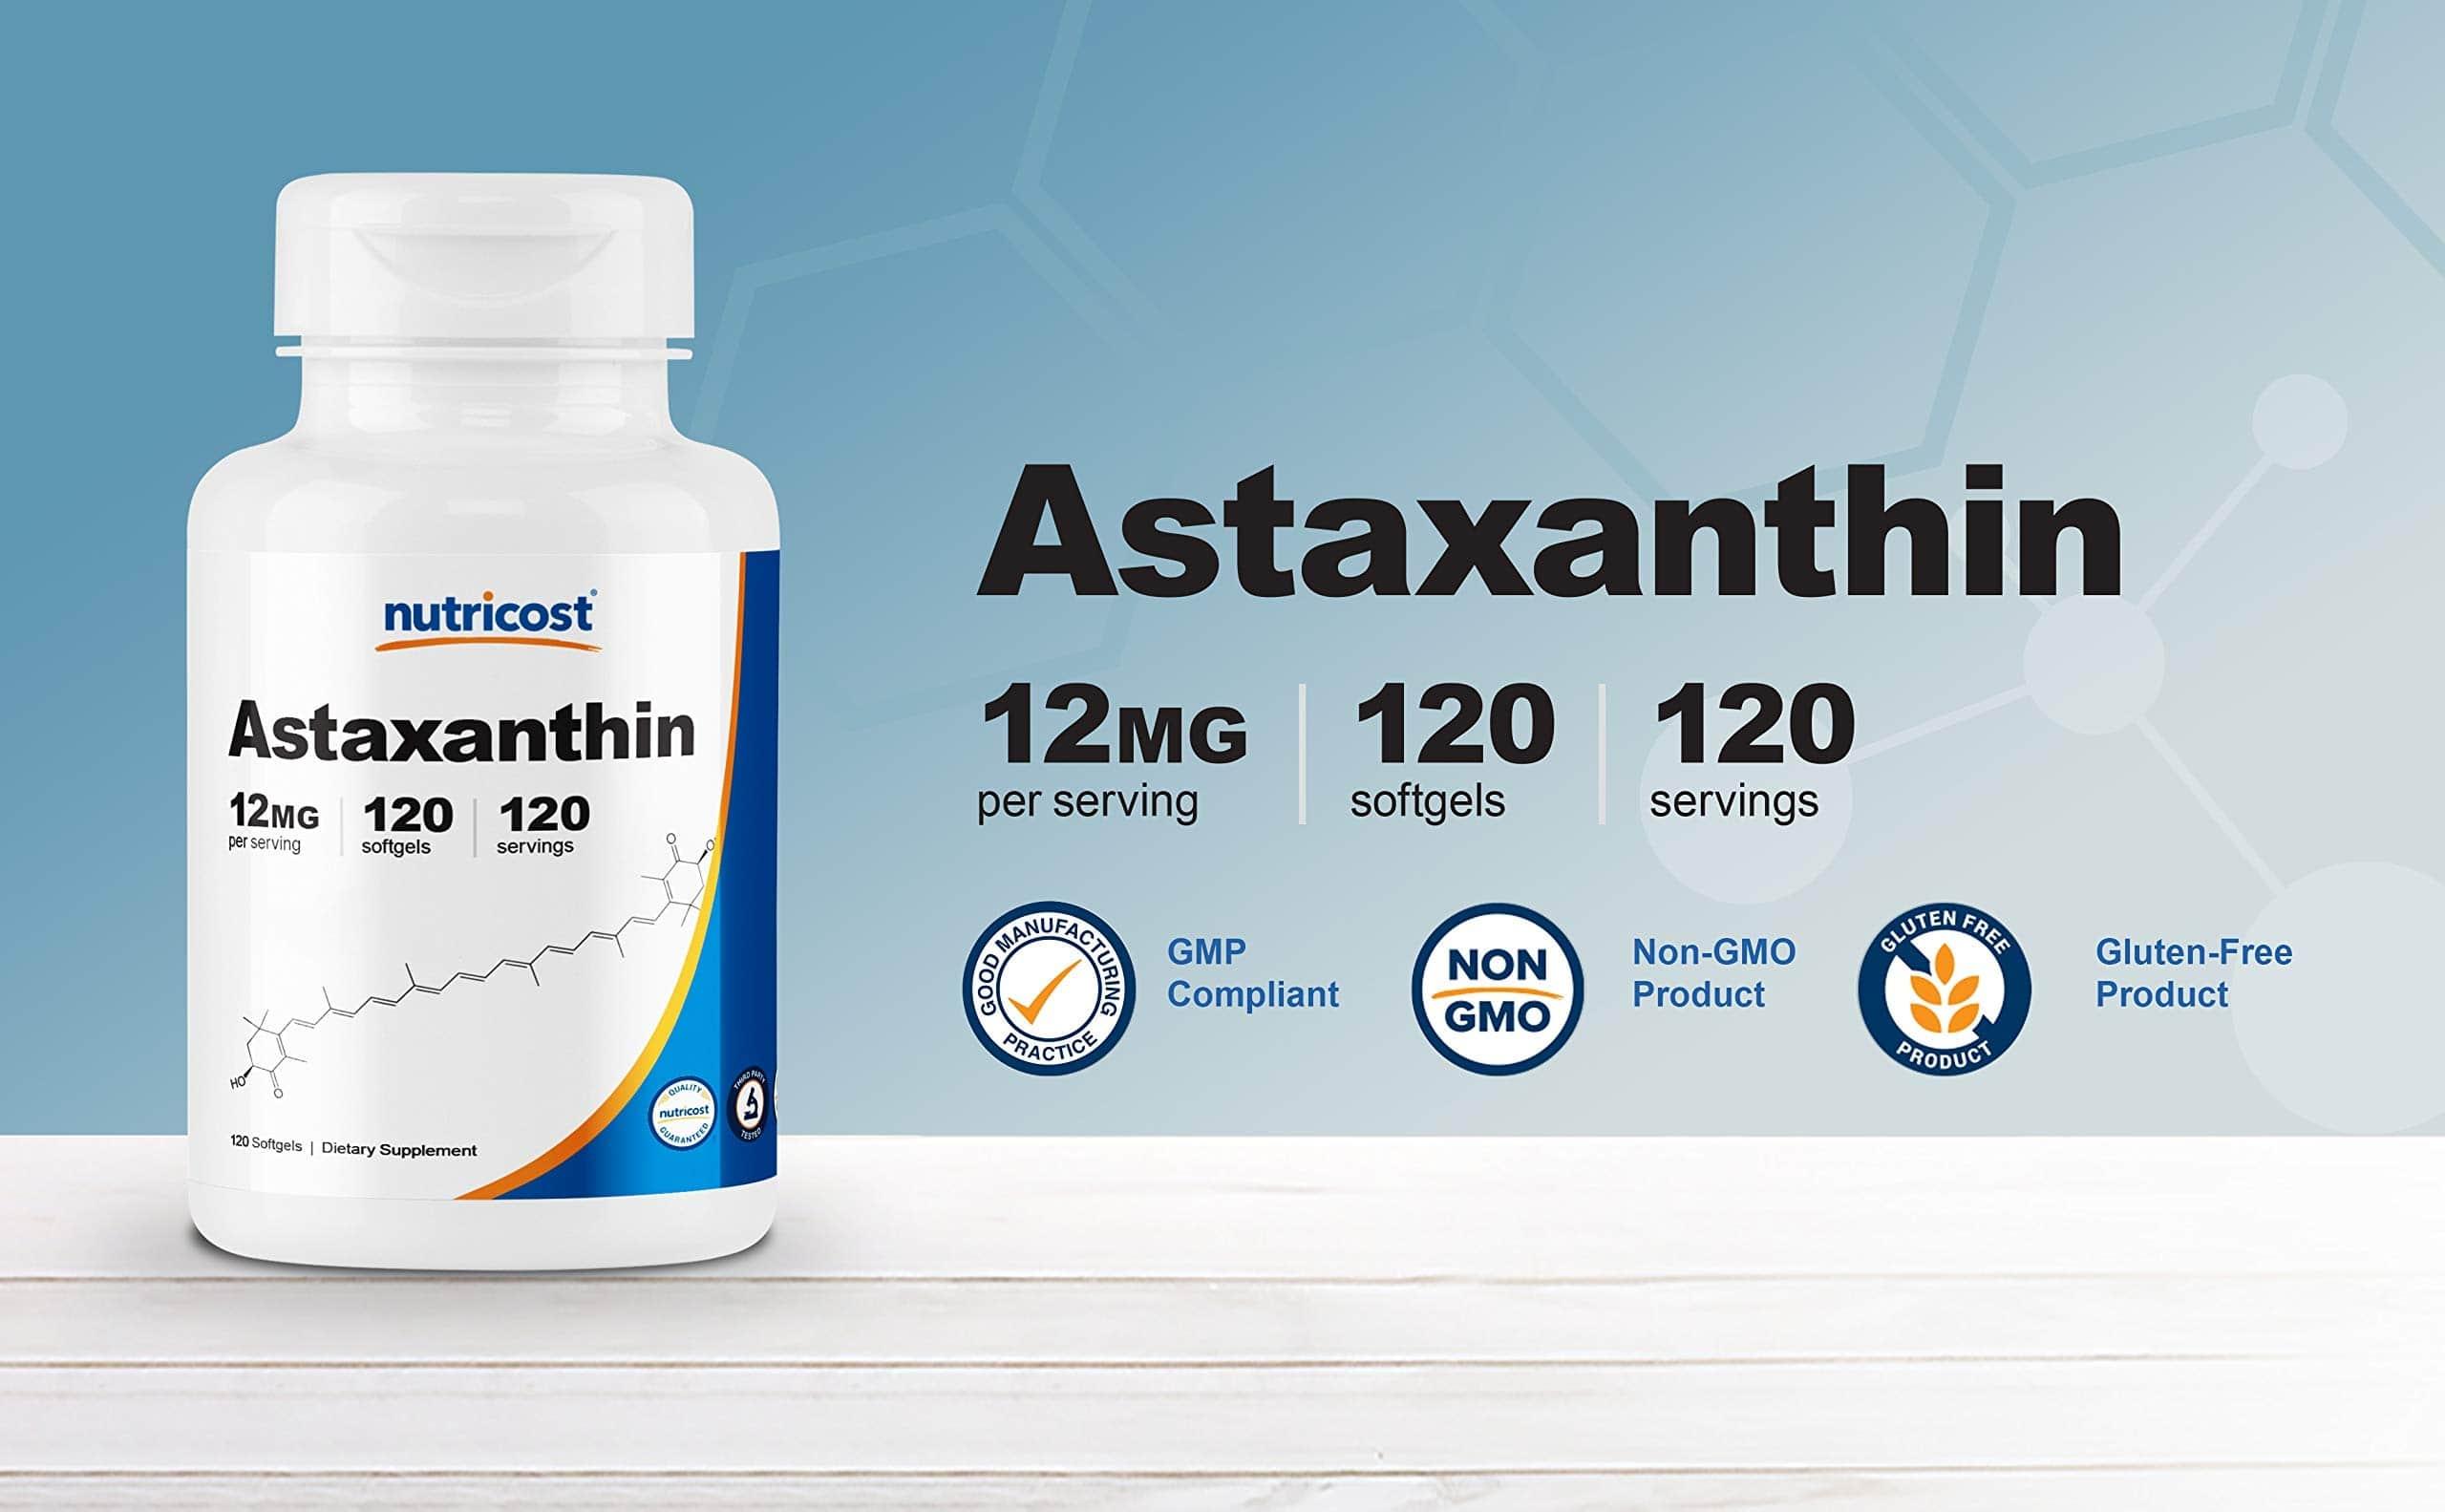 Nutricost - Astaxanthin 12mg (120 viên) - 71adttmpwzl